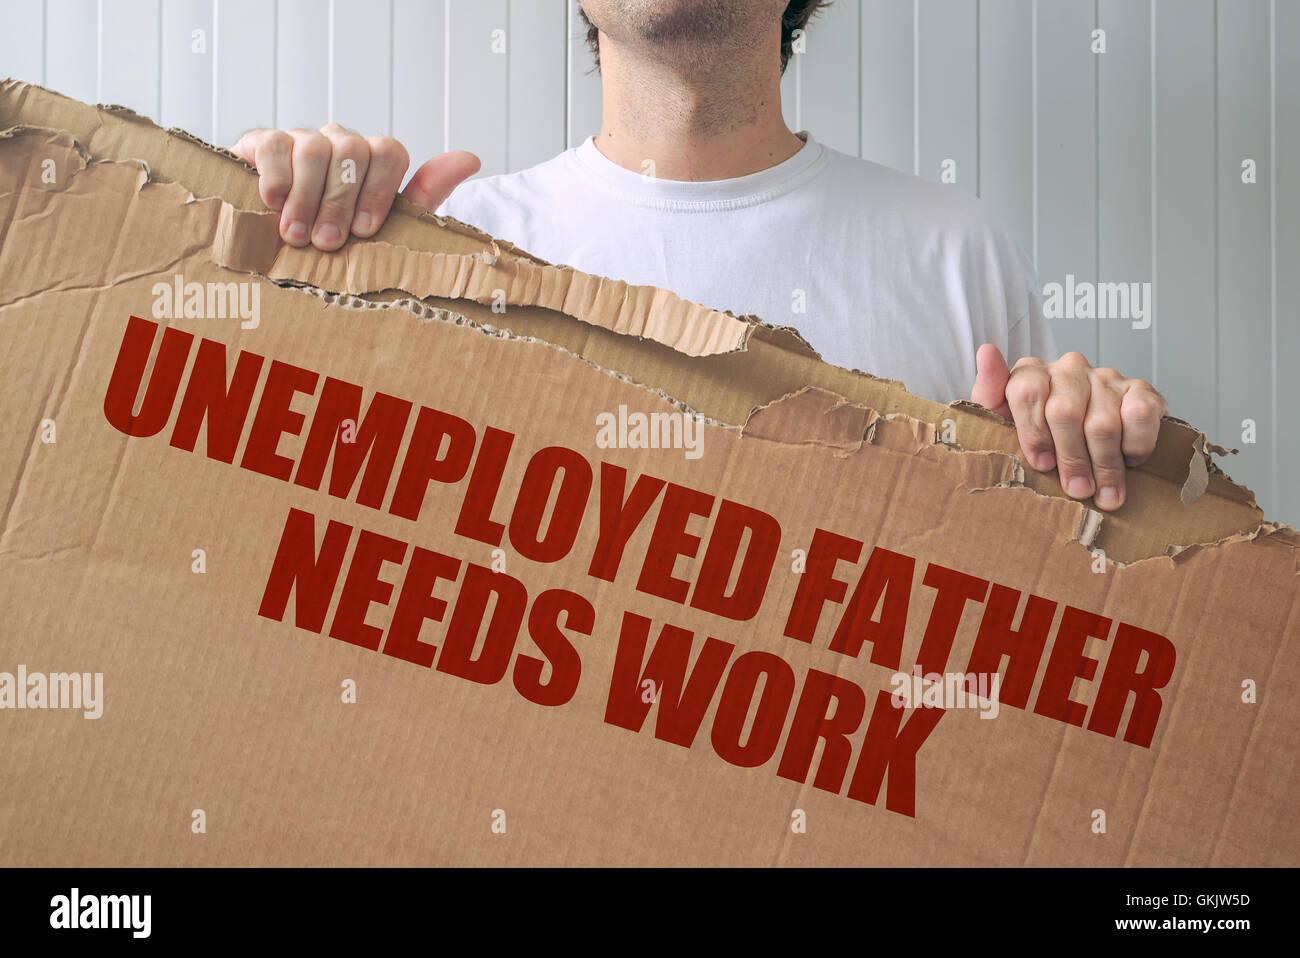 unemployed father needs work man holding banner job seeking stock photo unemployed father needs work man holding banner job seeking title